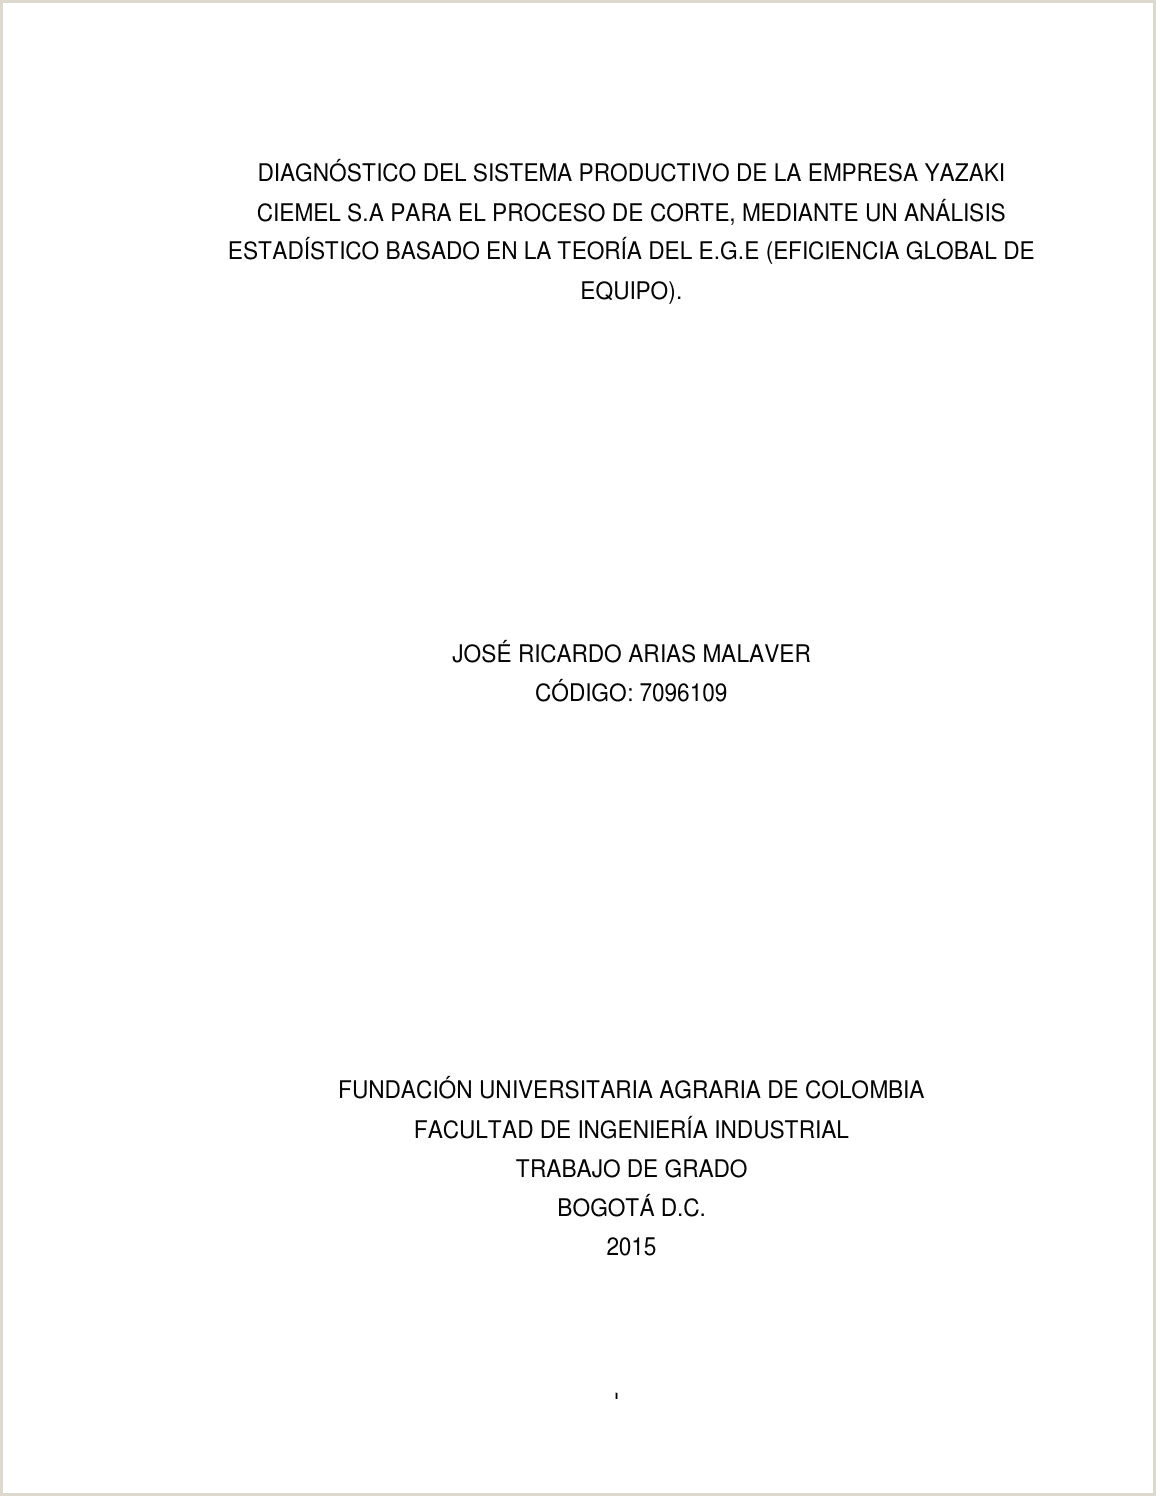 Formato Hoja De Vida Colombia Tesis 0220 I I by Maosabo issuu